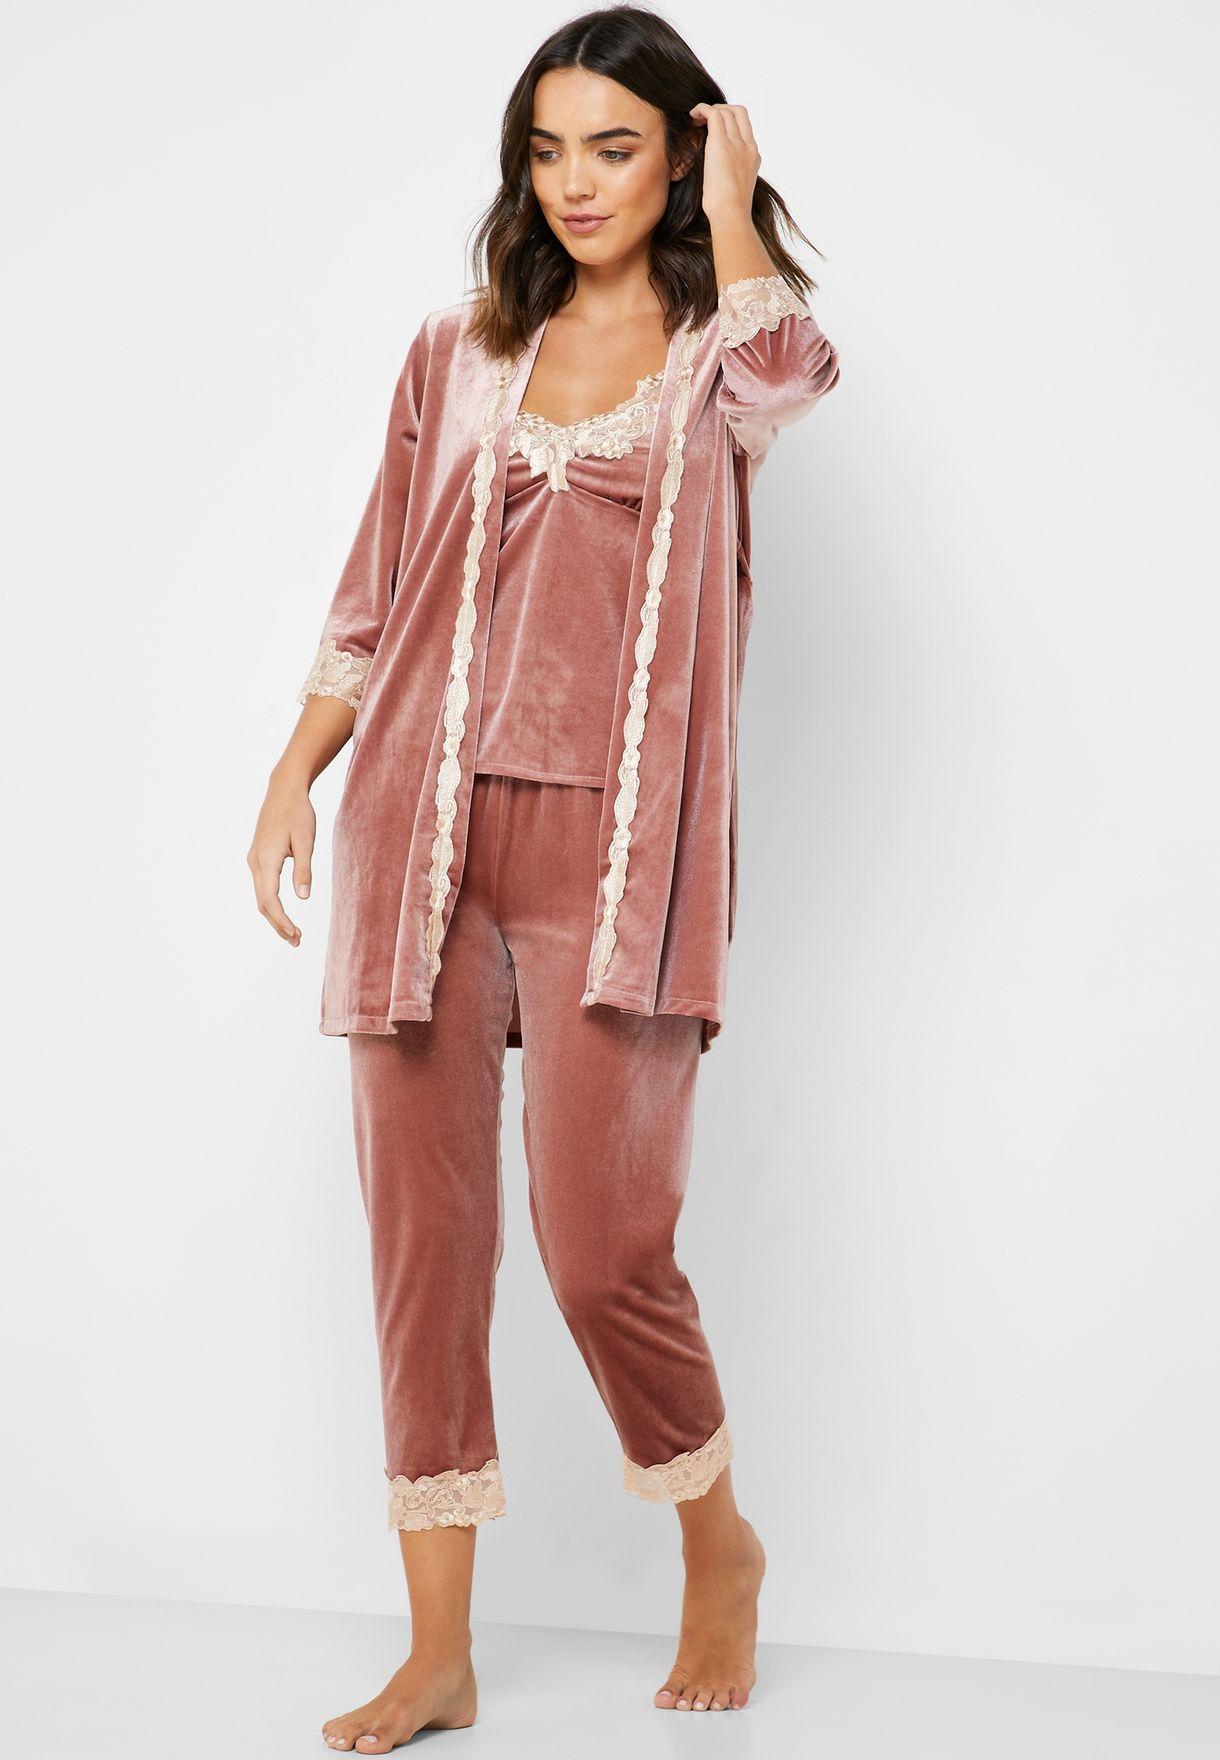 4 In 1 Velvet Nightdress Robe Pyjama Set